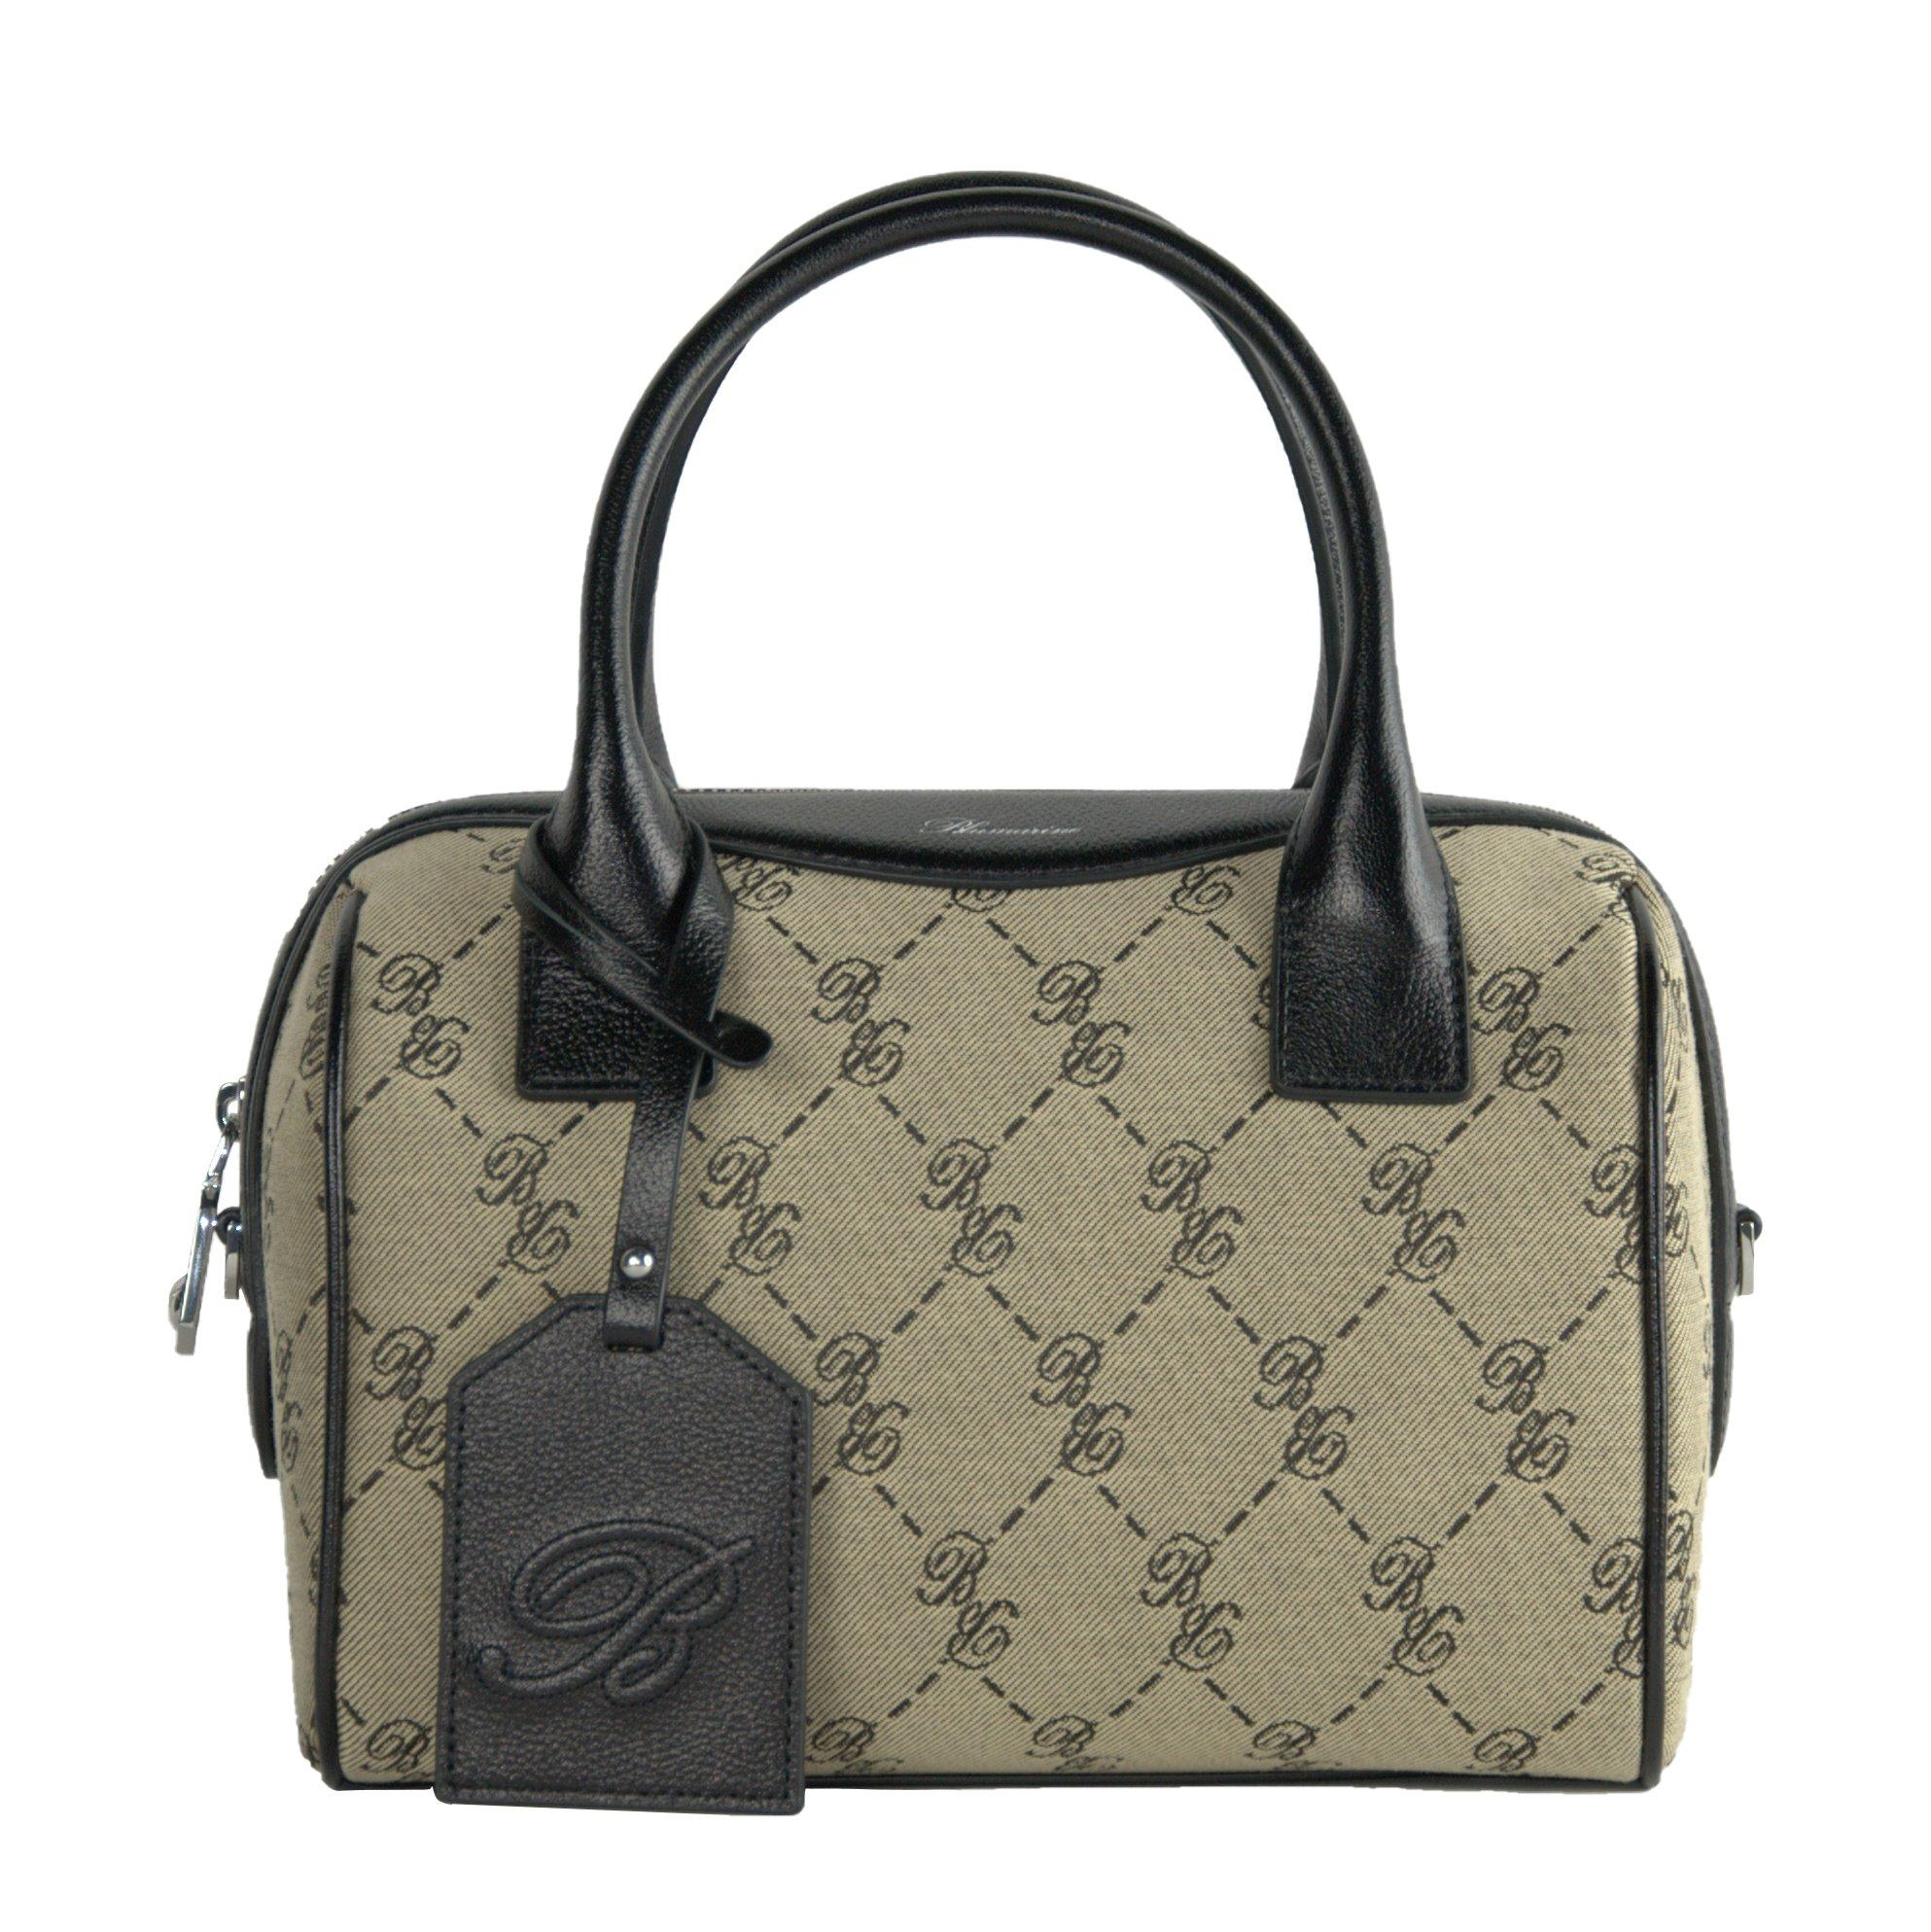 Blumarine Women's Bowling Bag Beige BL1421376